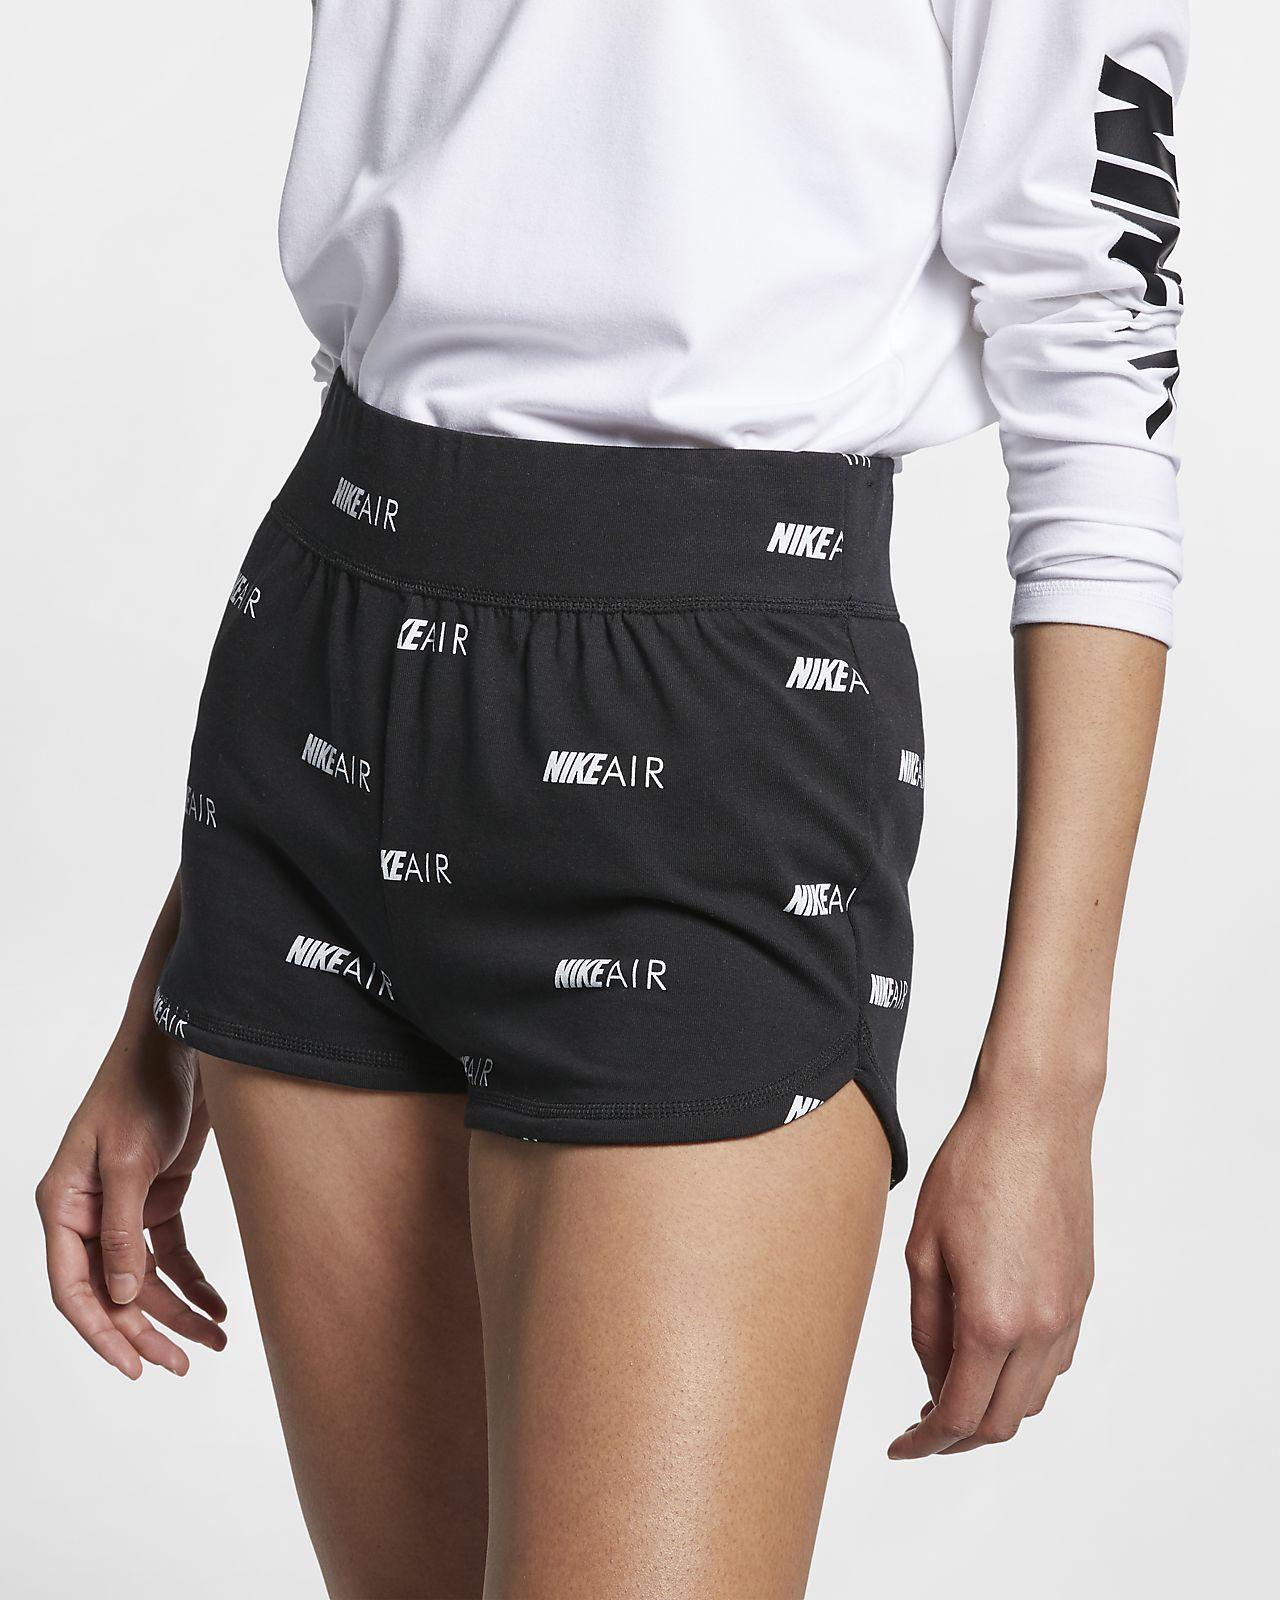 Nike Air mønstret dameshorts